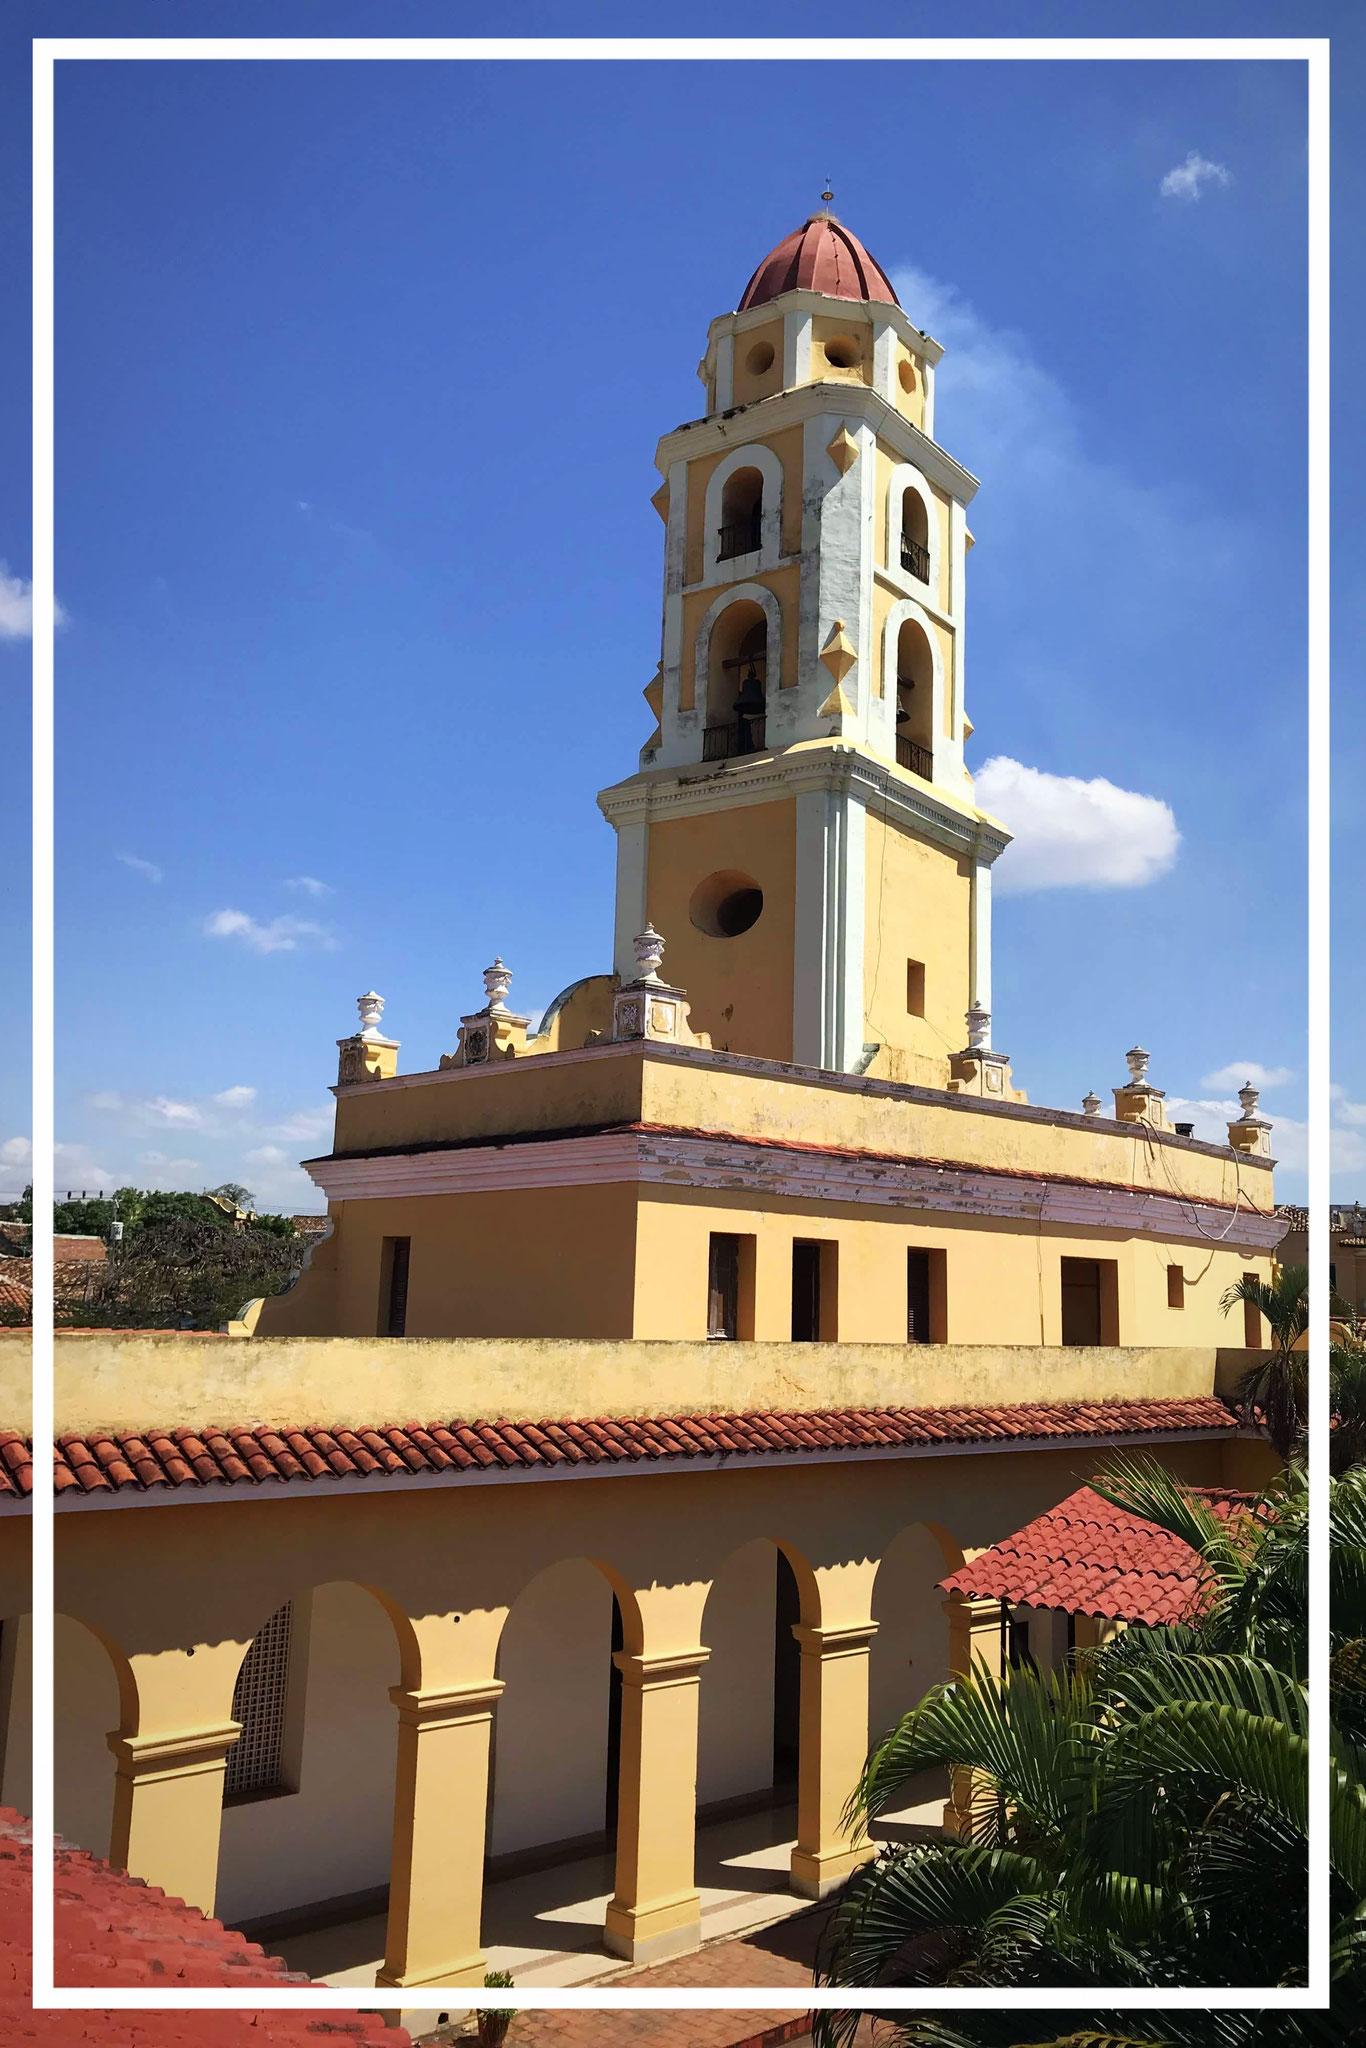 Convento San Francisco de Asis (Kloster des hl. Franziskus von Assisi)